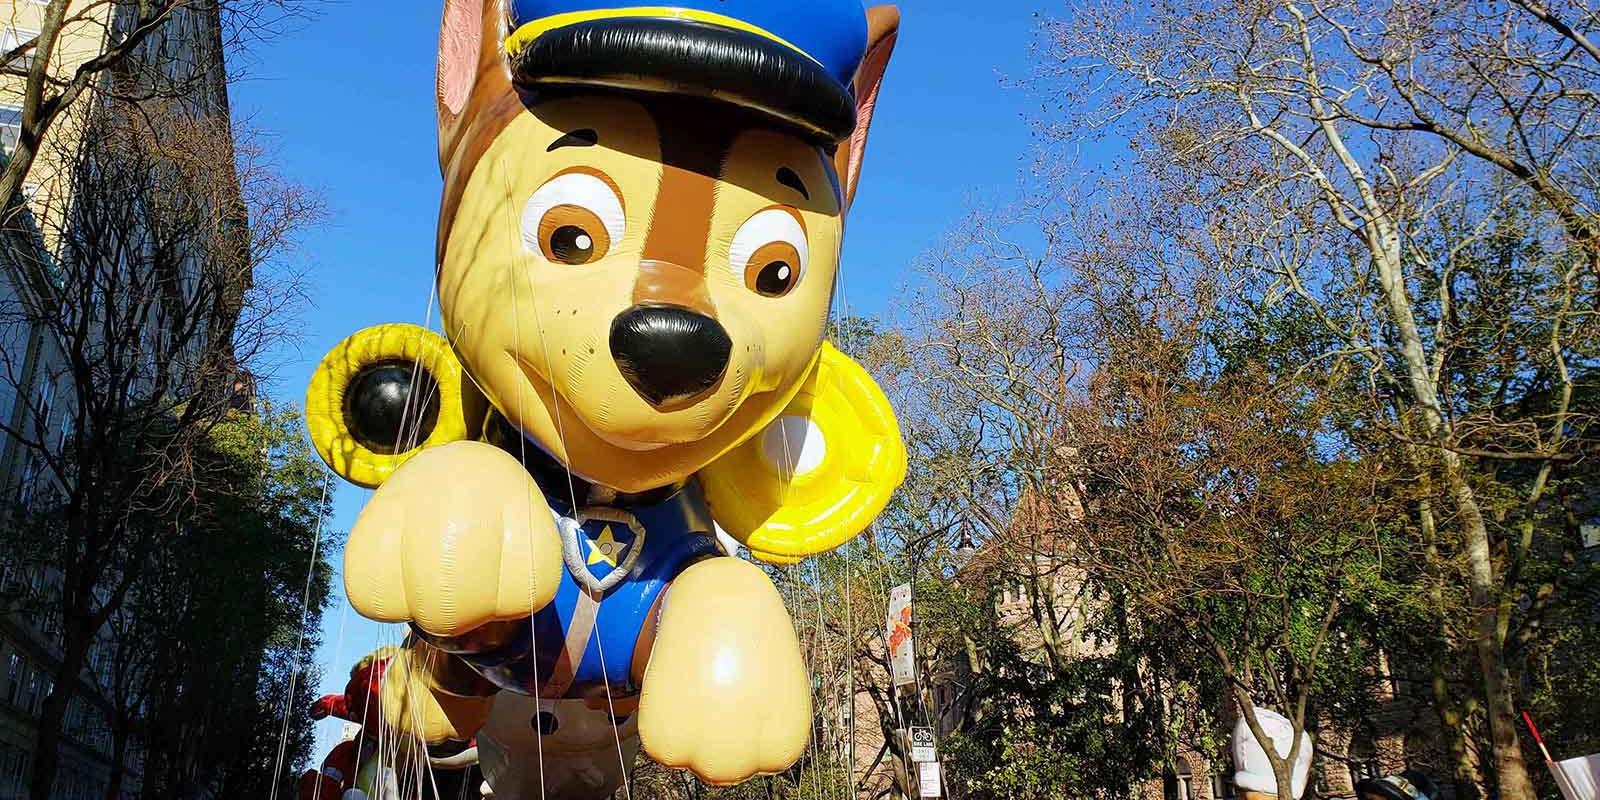 Paw Patrol Balloon at the Thanksgiving Parade